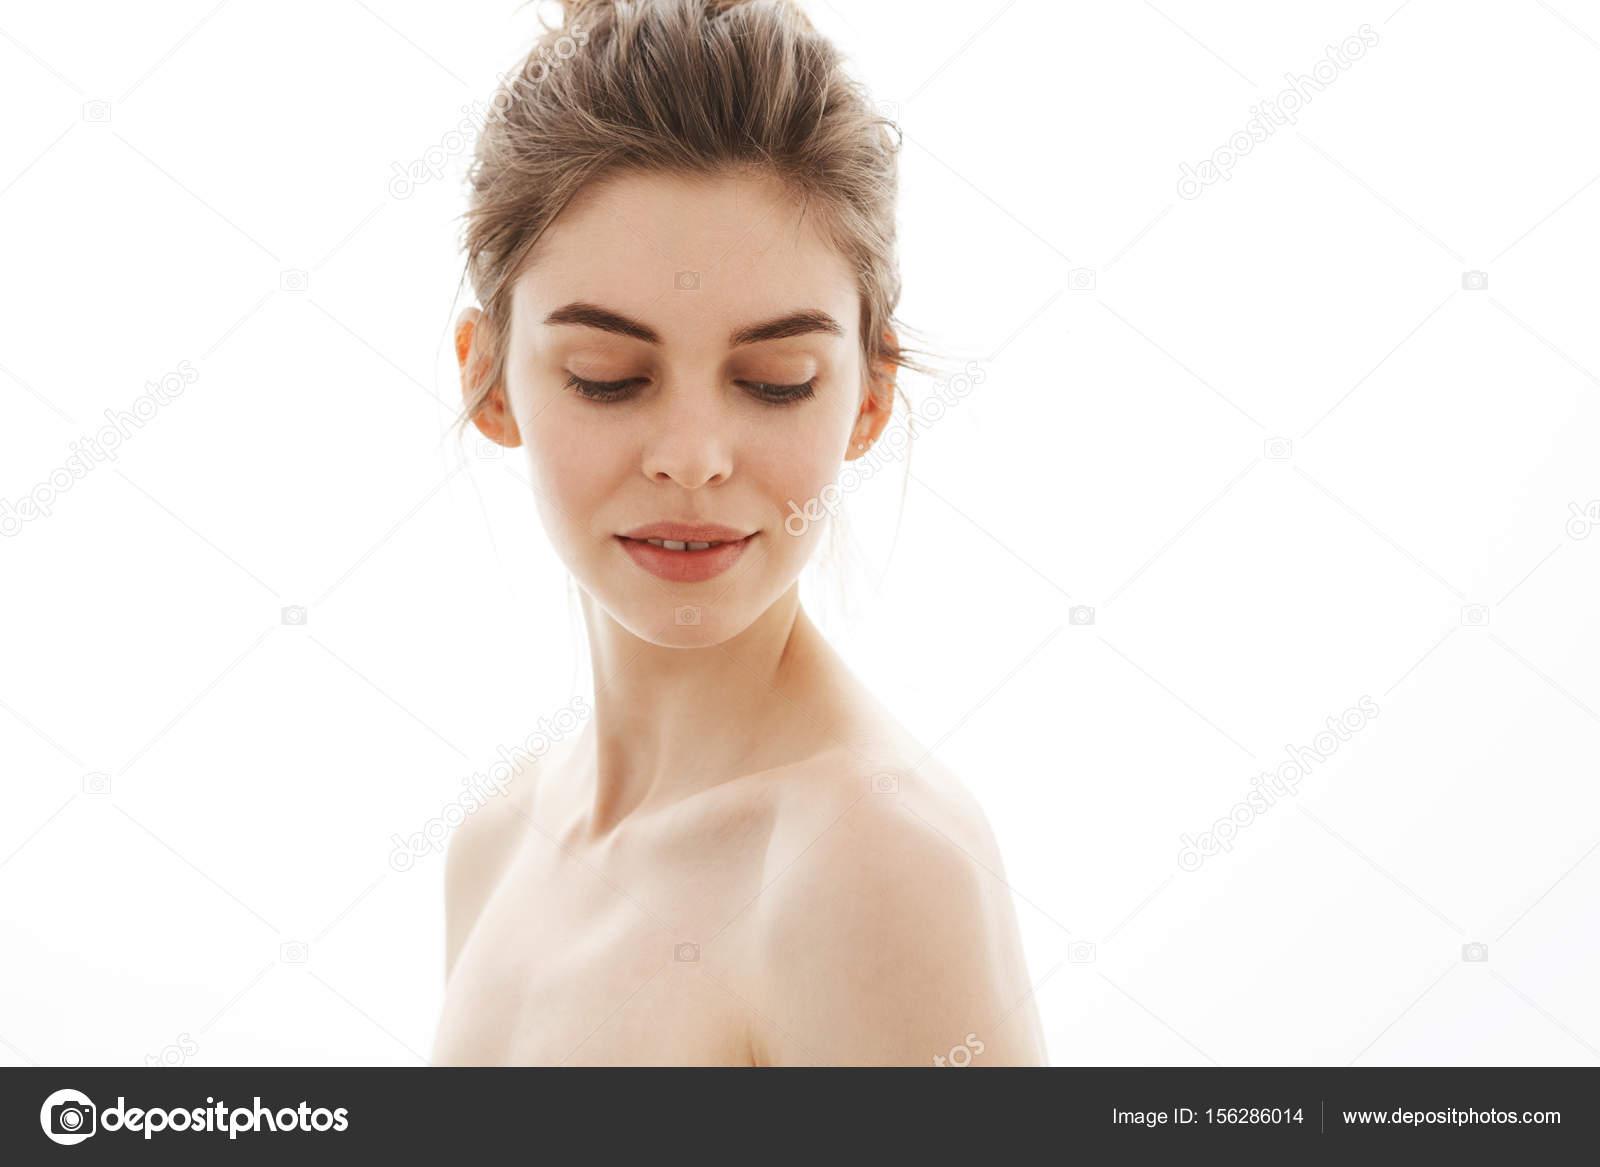 jonge naakt meisje pics